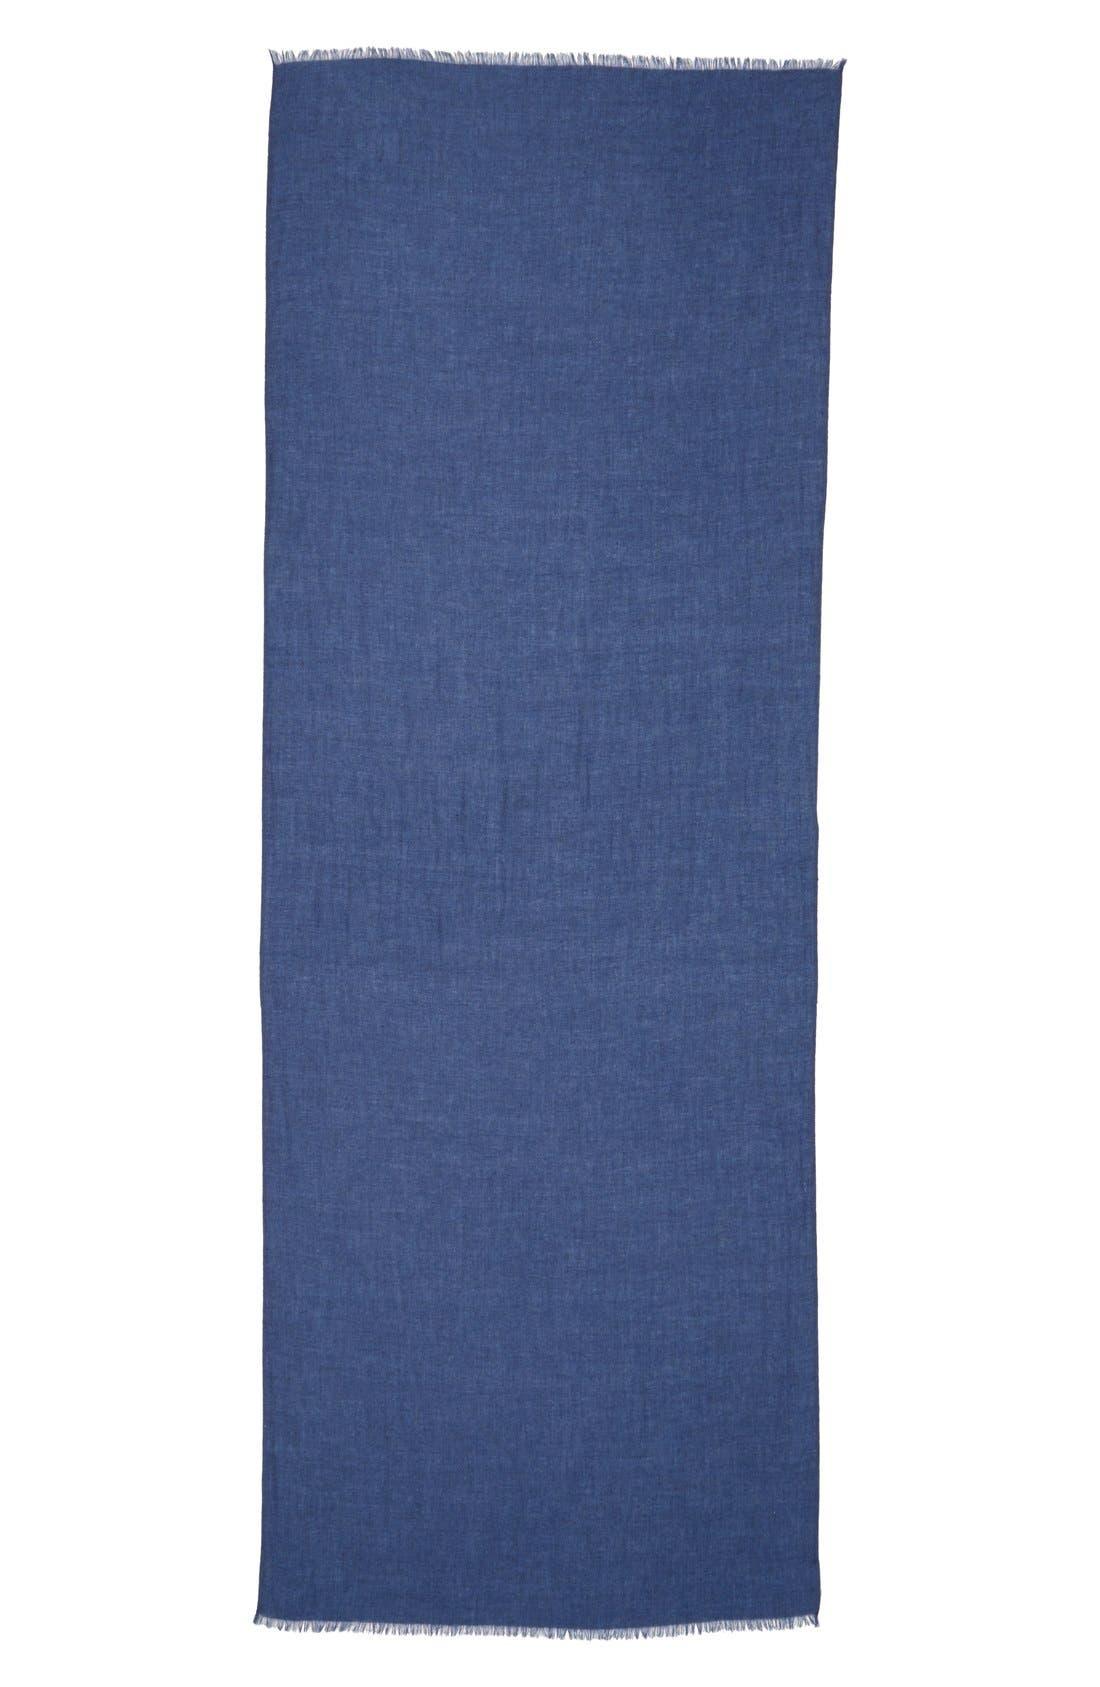 Wool & Cashmere Wrap,                             Alternate thumbnail 51, color,